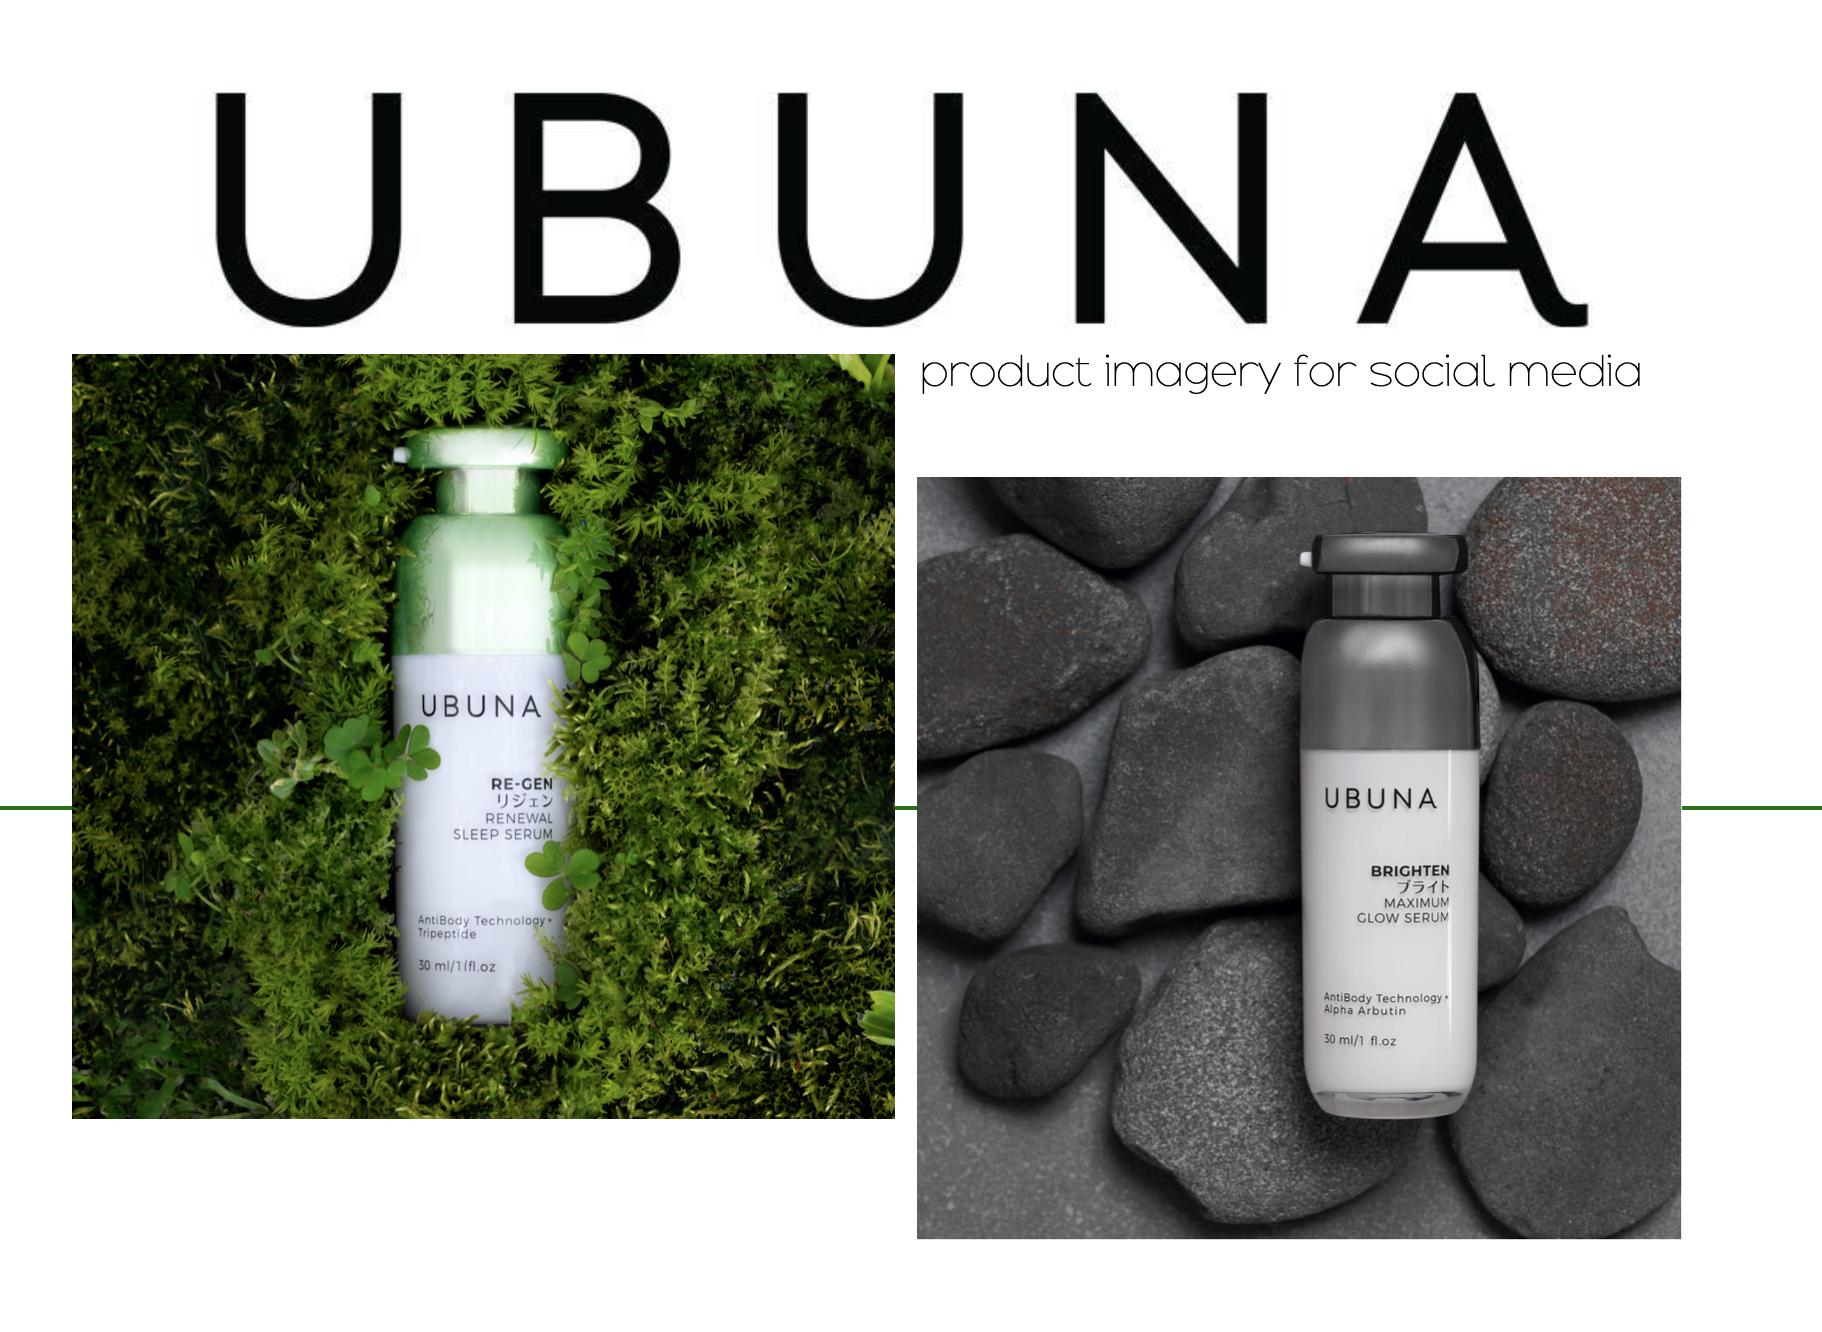 Ubuna product imagery